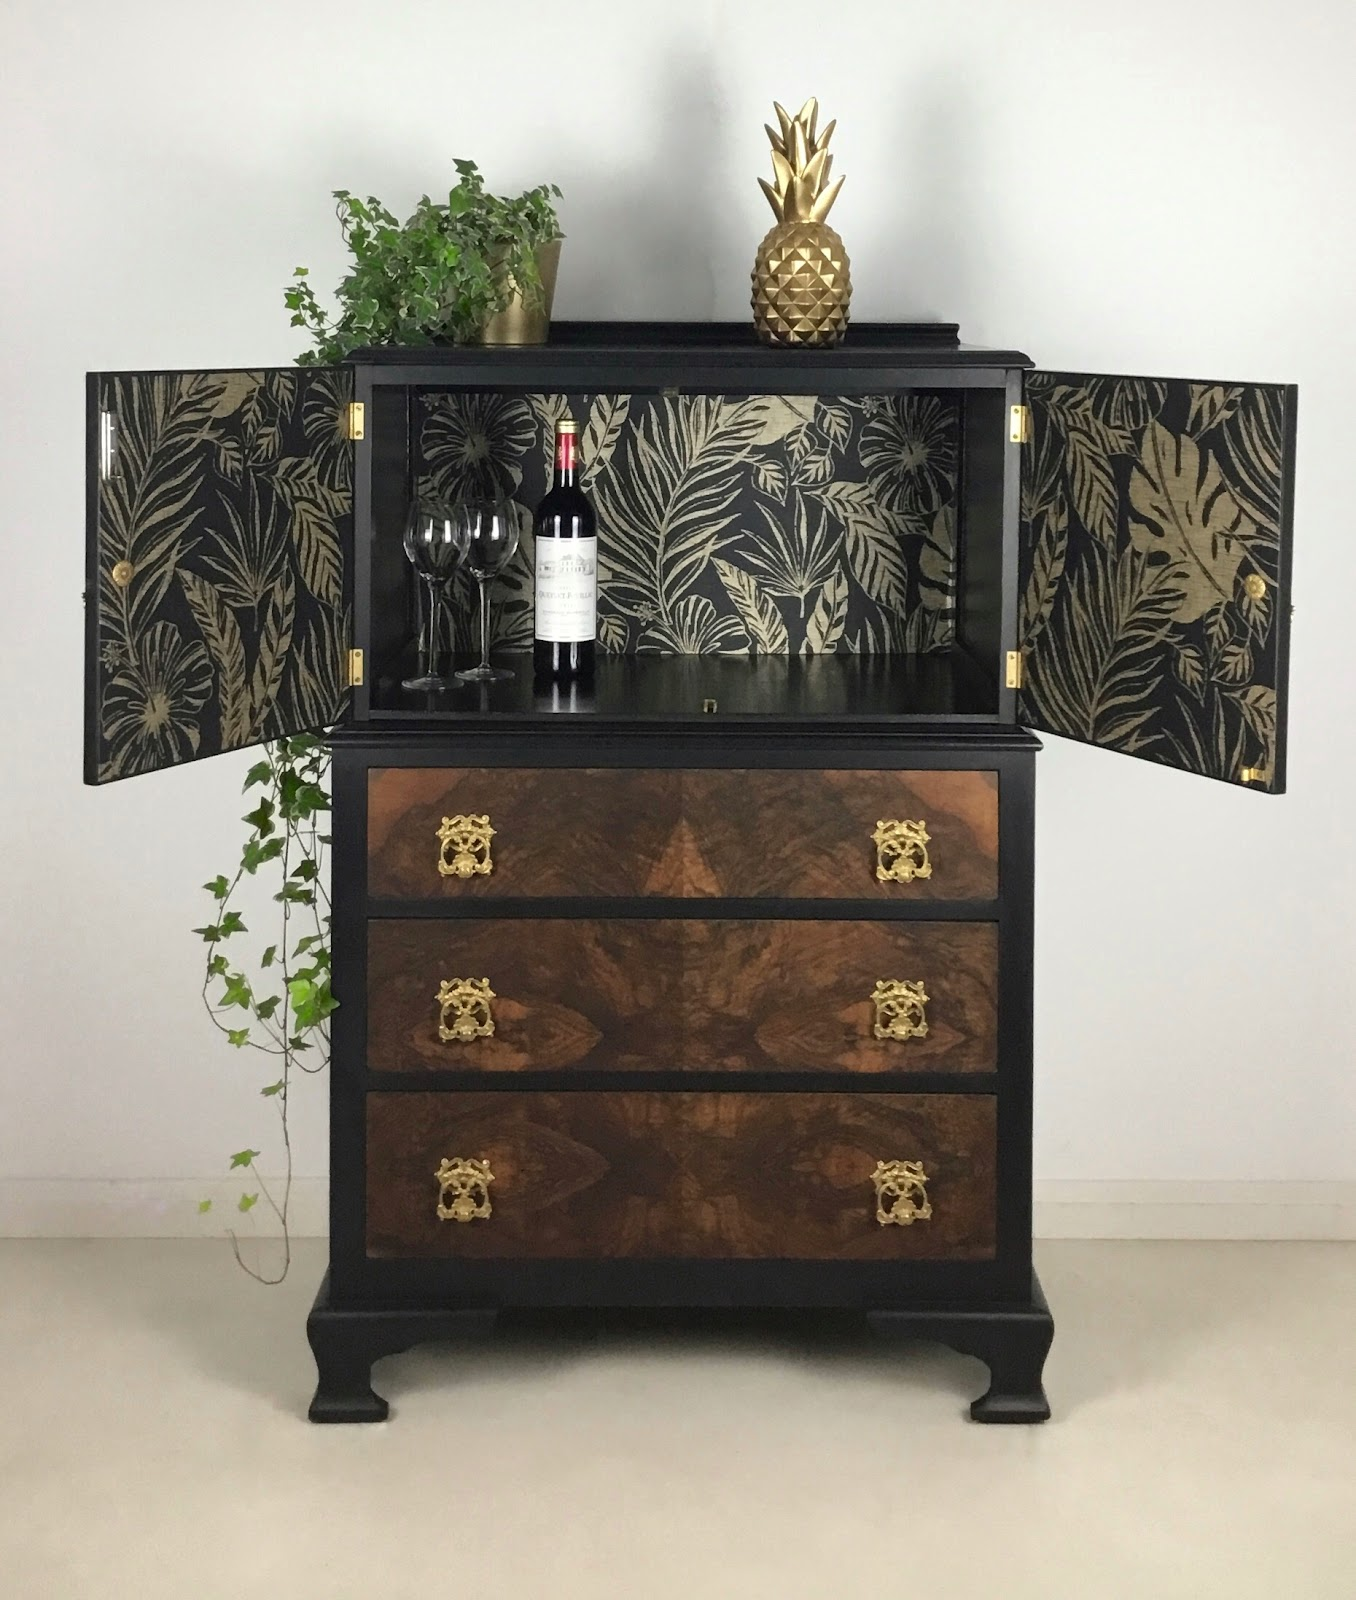 Vintage burr walnut veneer drinks cabinet